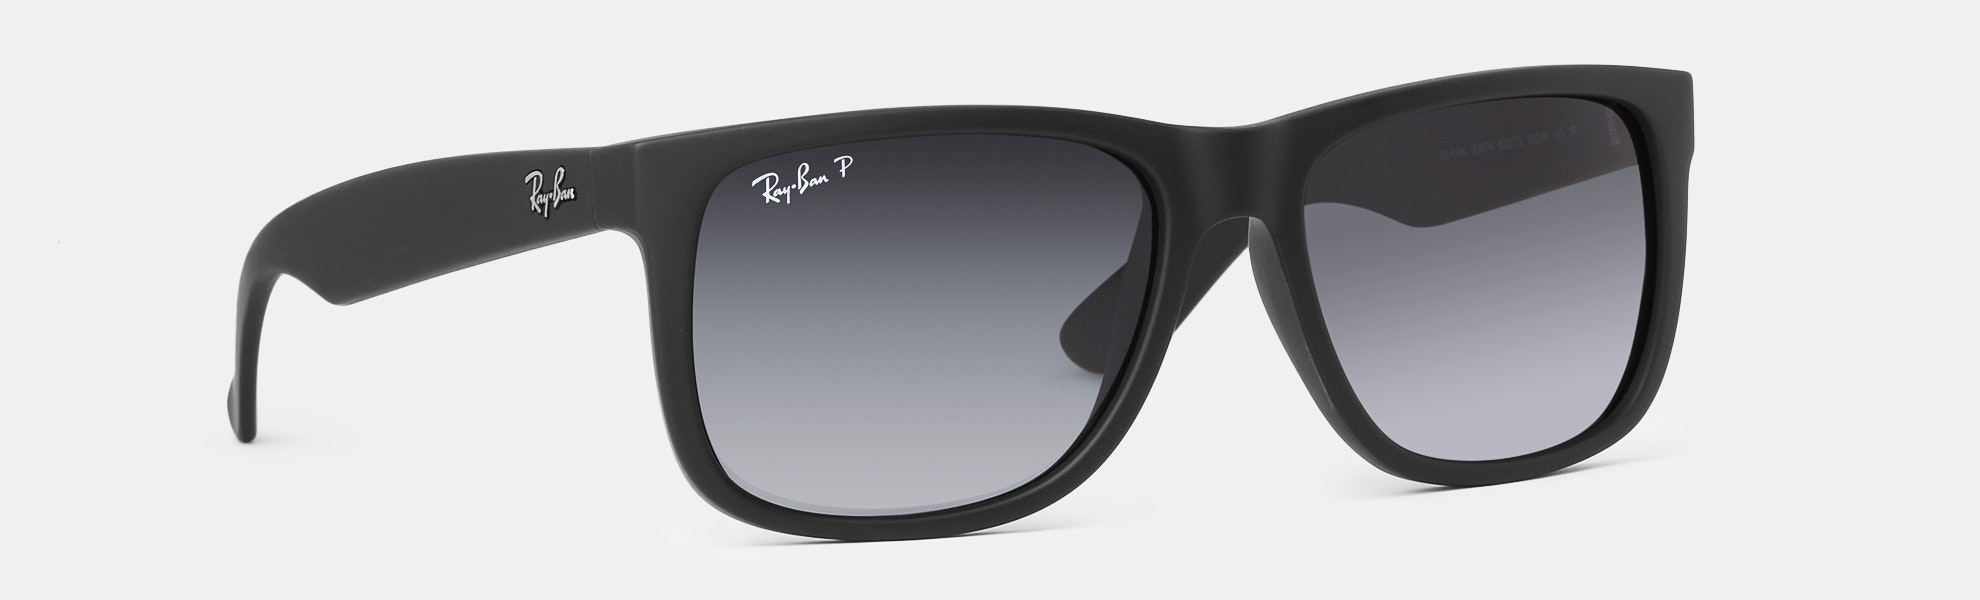 8707410773f ... where can i buy ray ban justin classic black polarized sunglasses 7ac19  c37bf